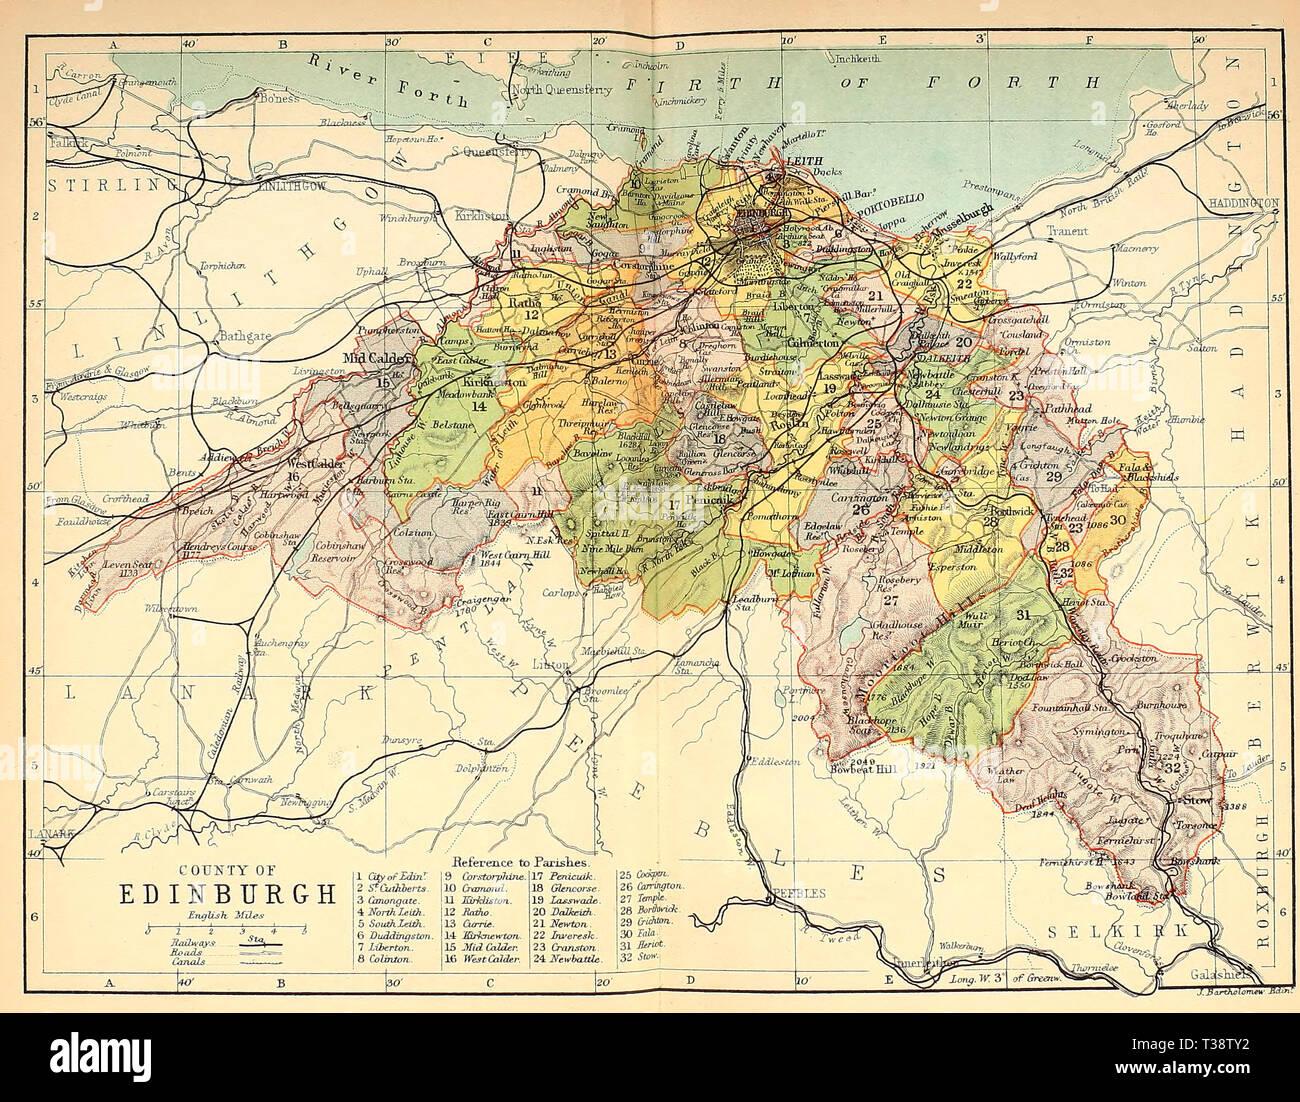 County of Edinburgh, Scotland, circa 1882 - Stock Image